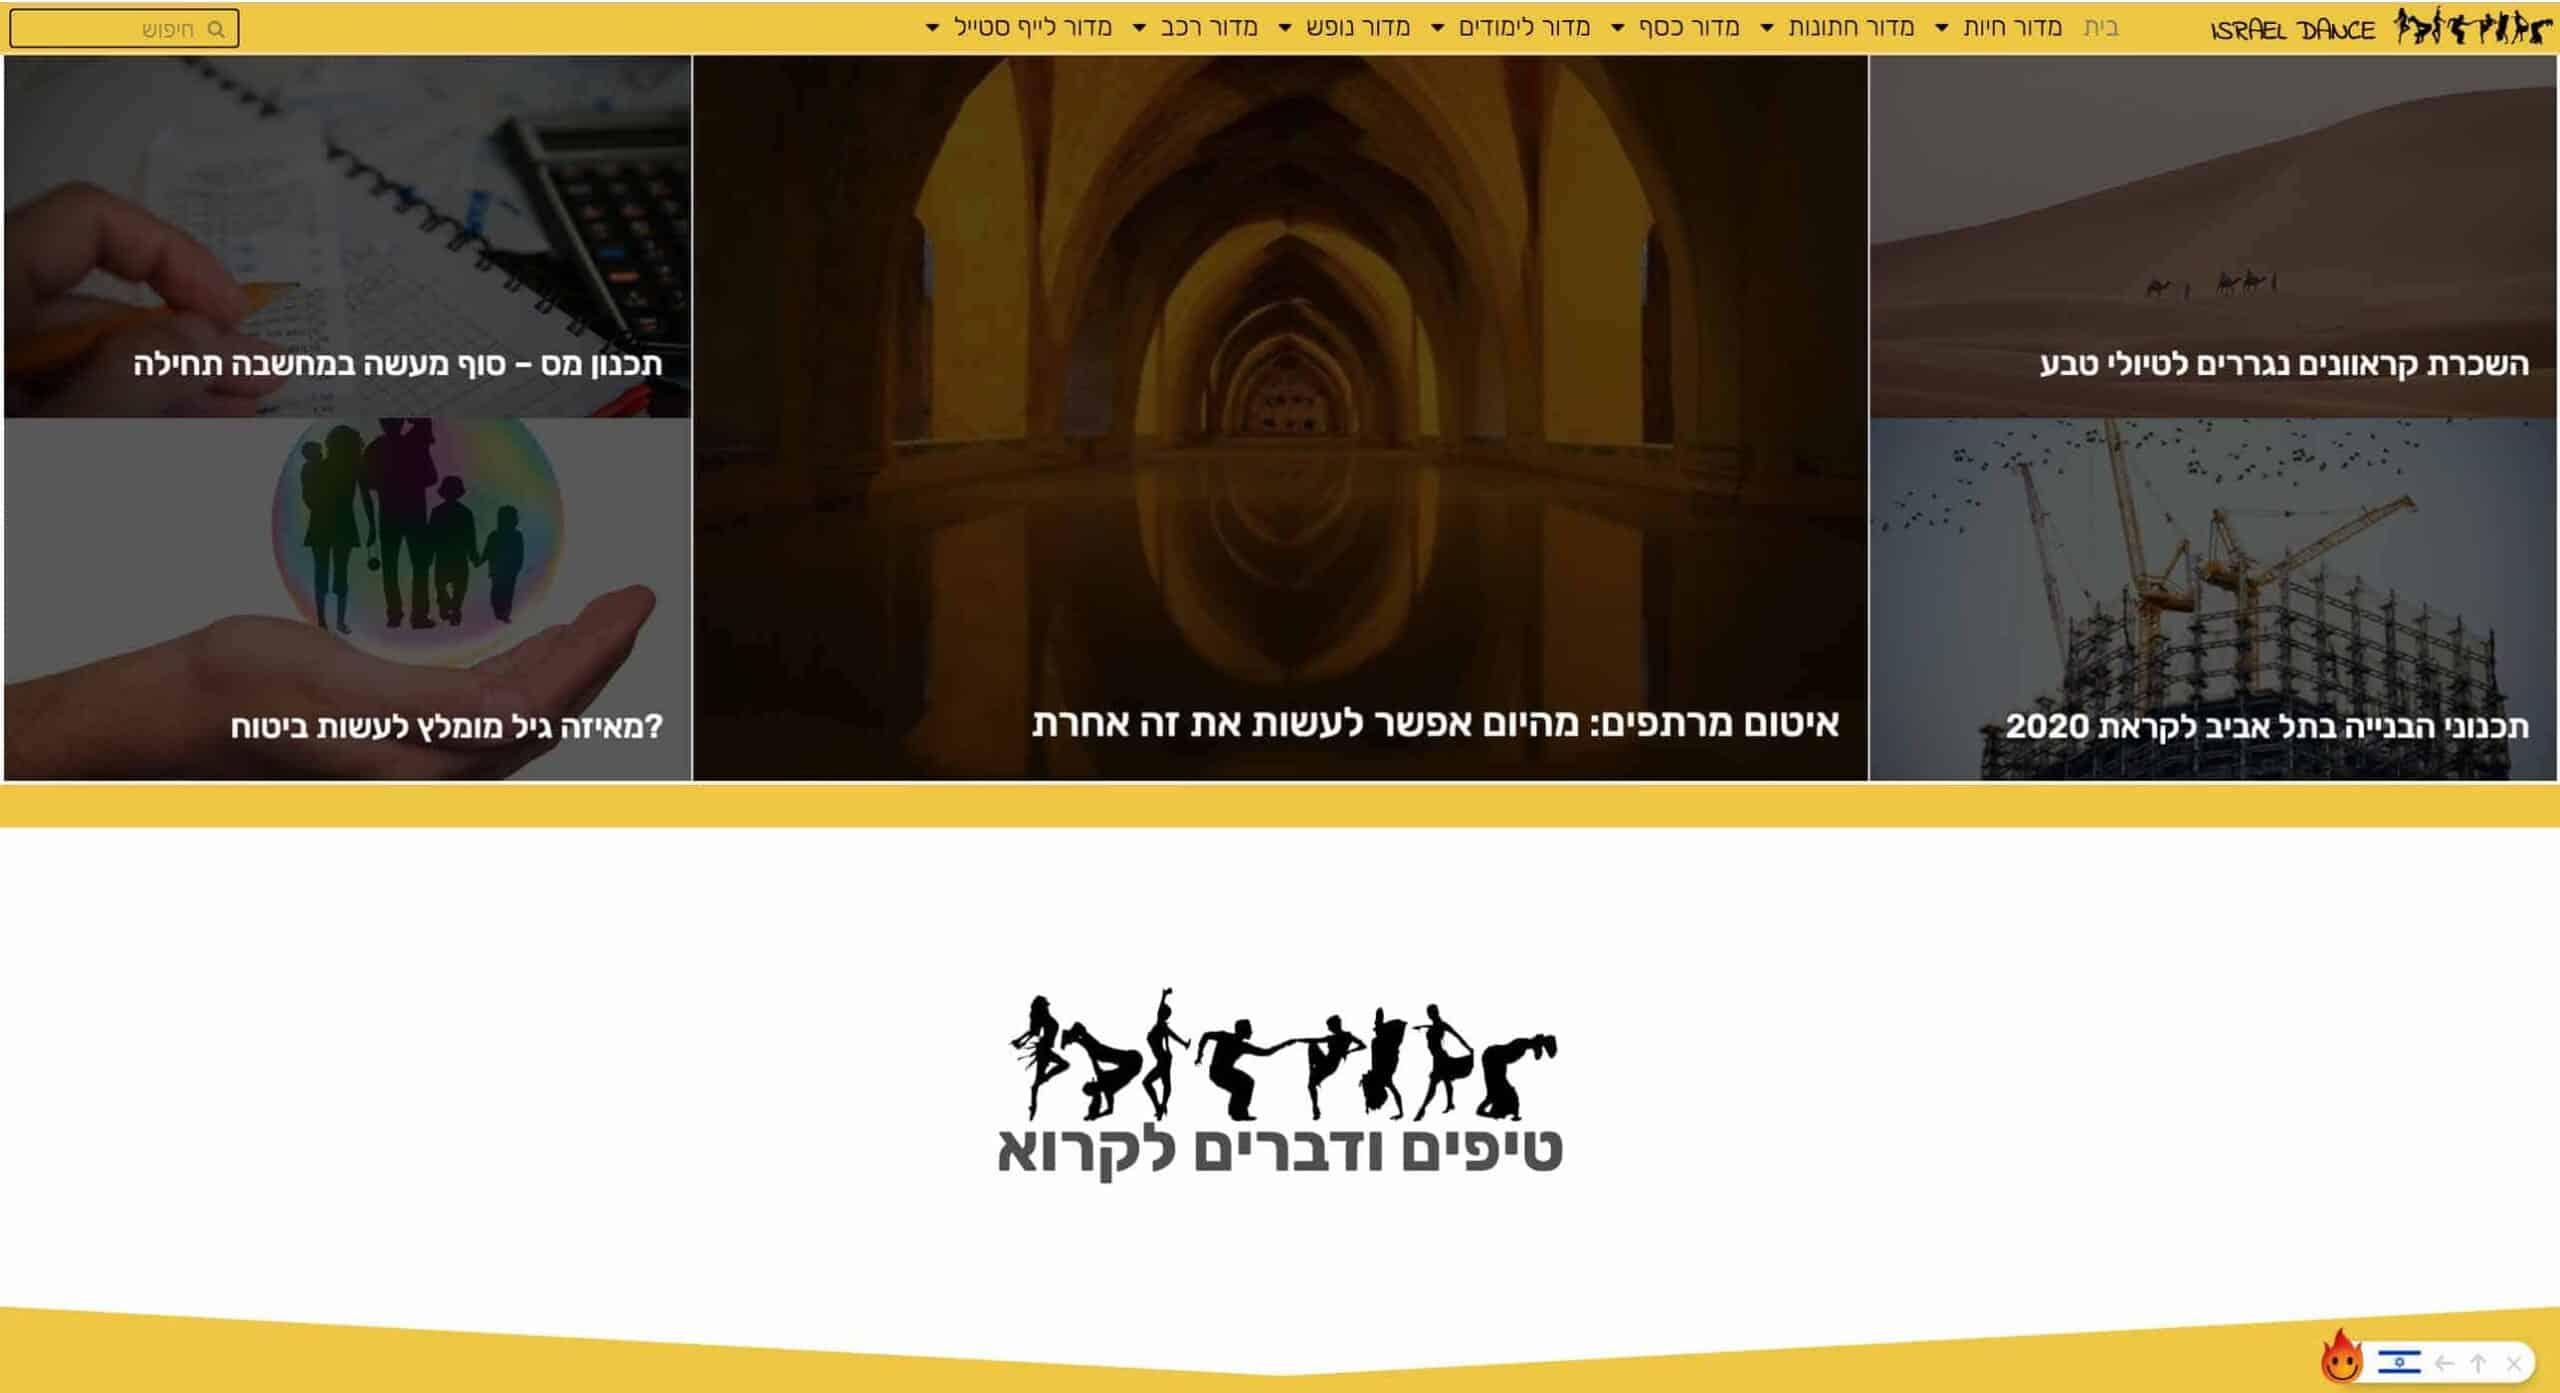 israeldance.co.il